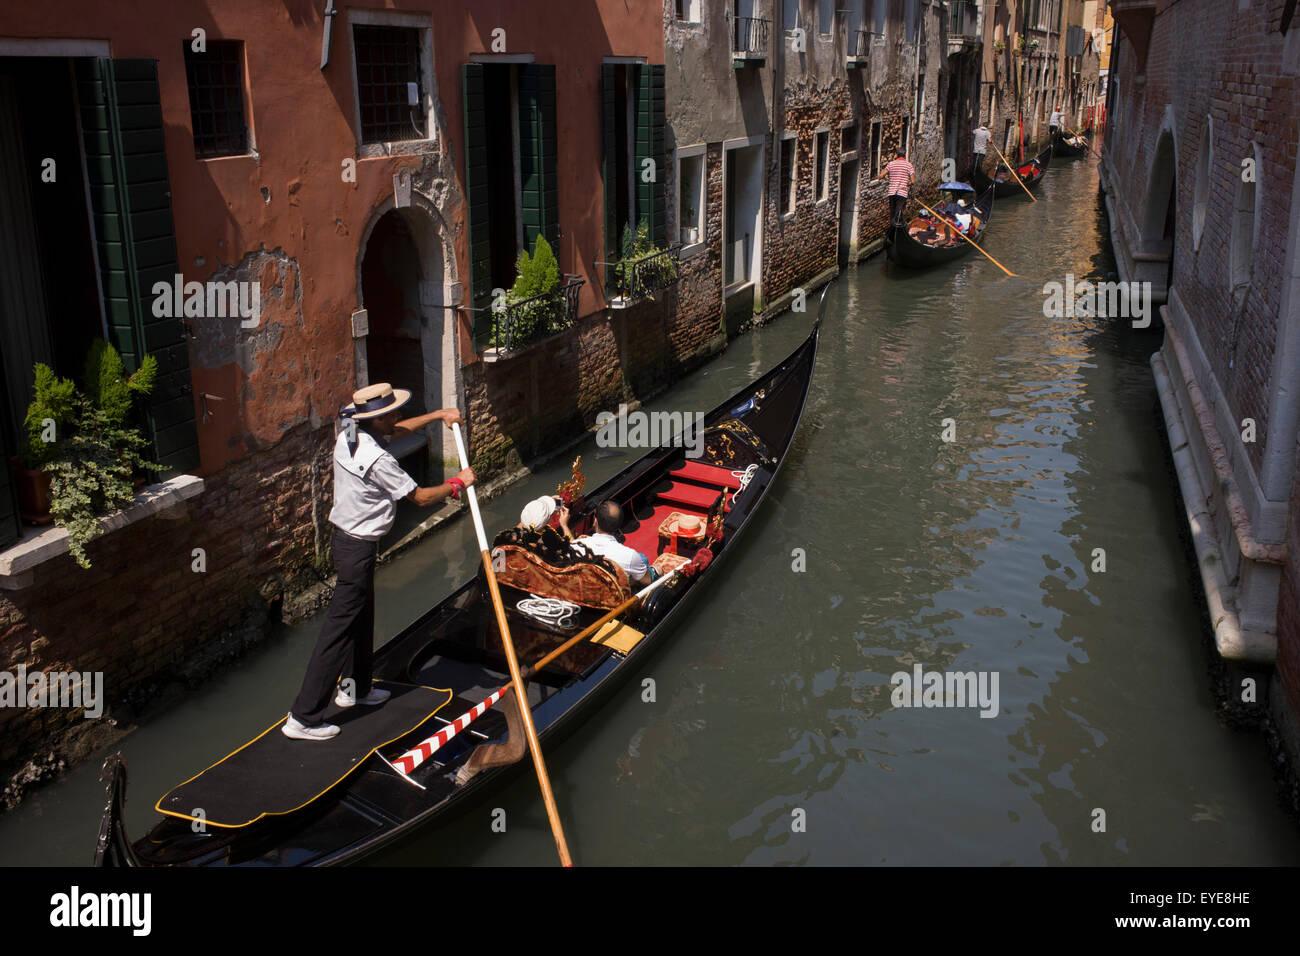 Venice Straw Boater Gondola Imágenes De Stock   Venice Straw Boater ... 59d973b0f21